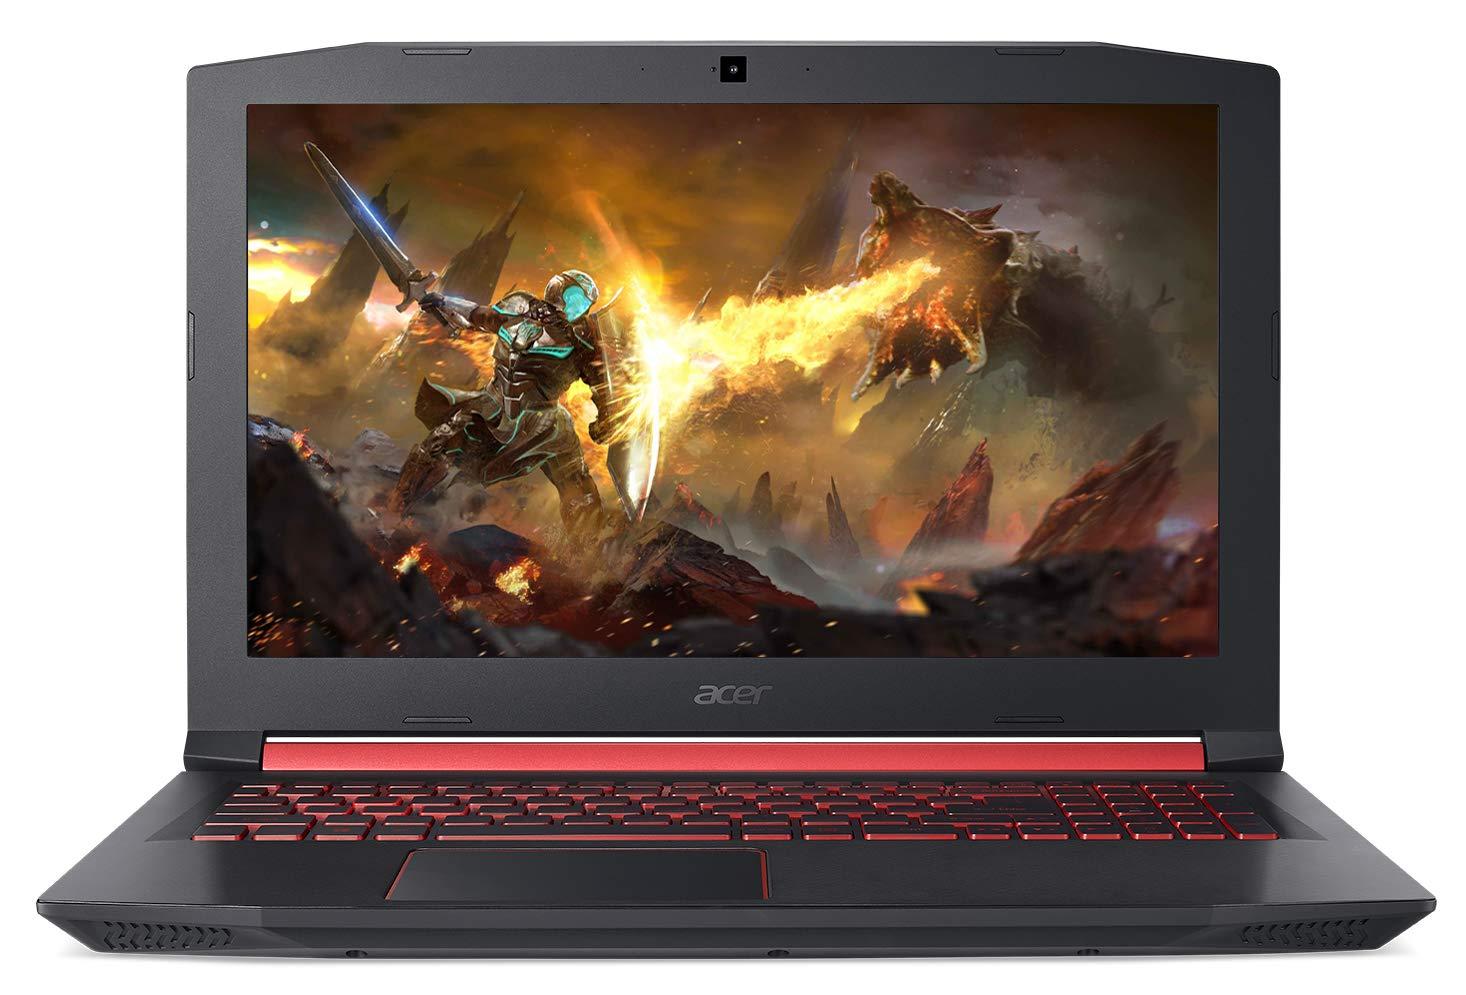 Acer Nitro 5 AN515-52 (Core i5-8300H, GTX 1060, 512 GB NVMe SSD; 144 Hz monitor) £799 Amazon Prime Day Deal